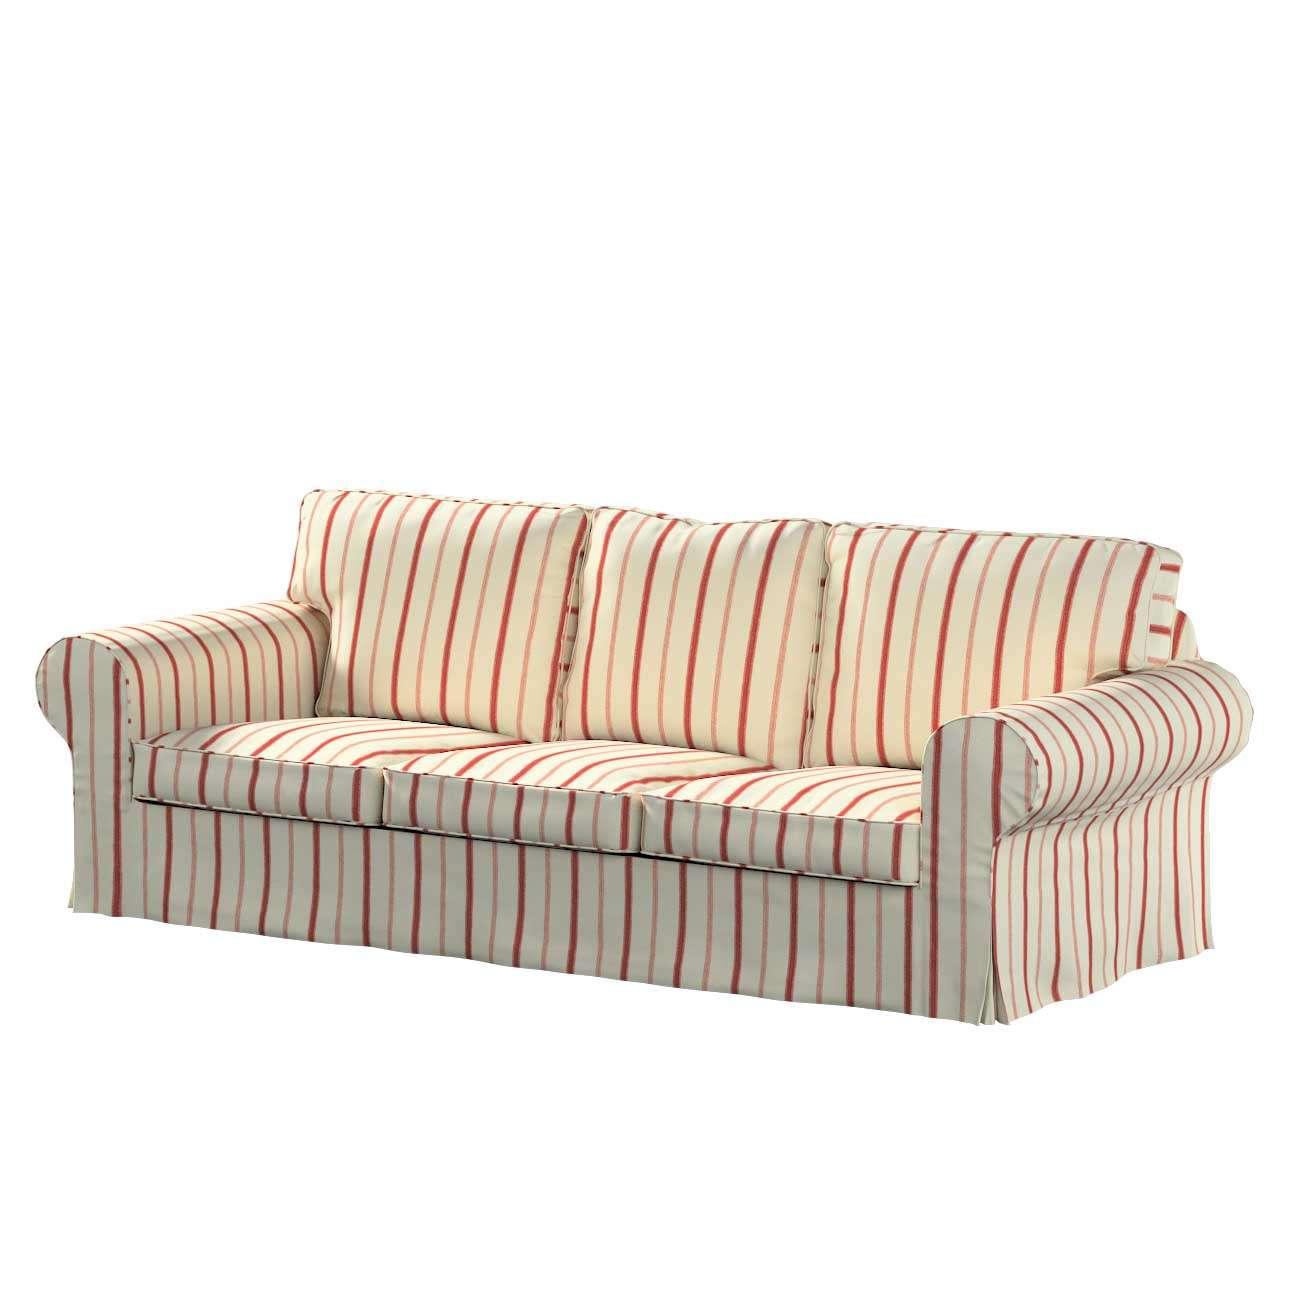 Brilliant Ektorp 3 Seater Sofa Cover Download Free Architecture Designs Rallybritishbridgeorg